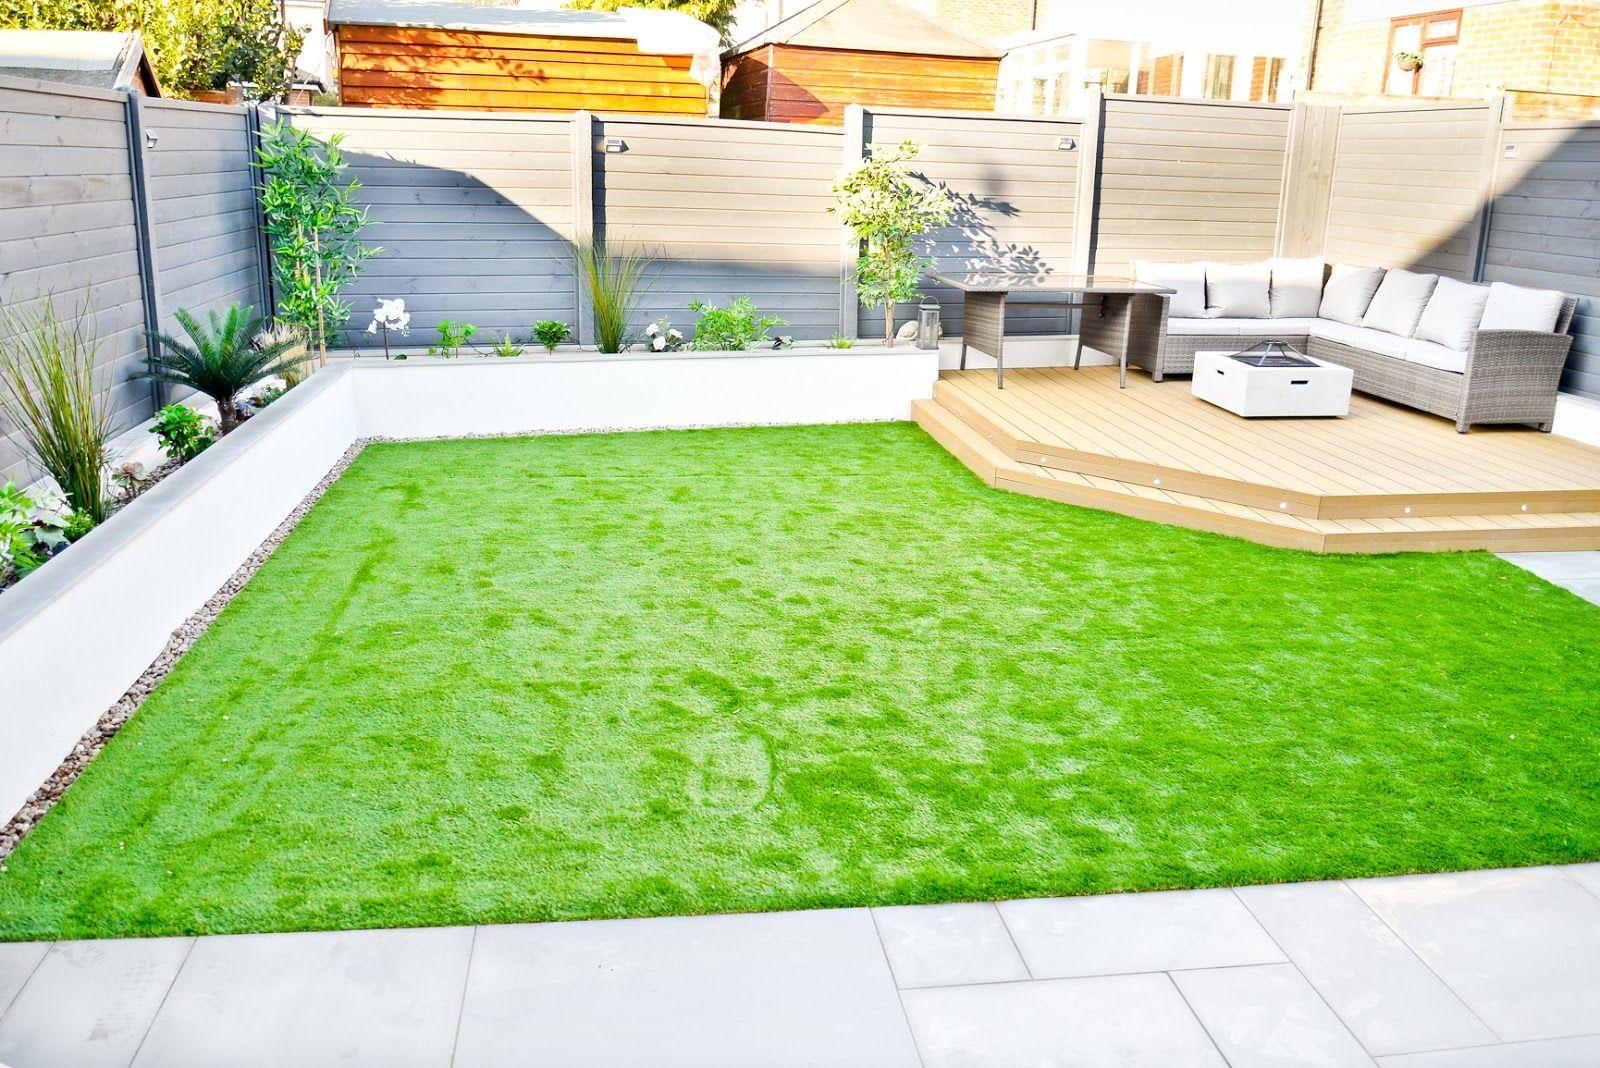 Our Back Garden Makeover - Before & After   Modern garden ... on Modern Back Garden Ideas id=57299